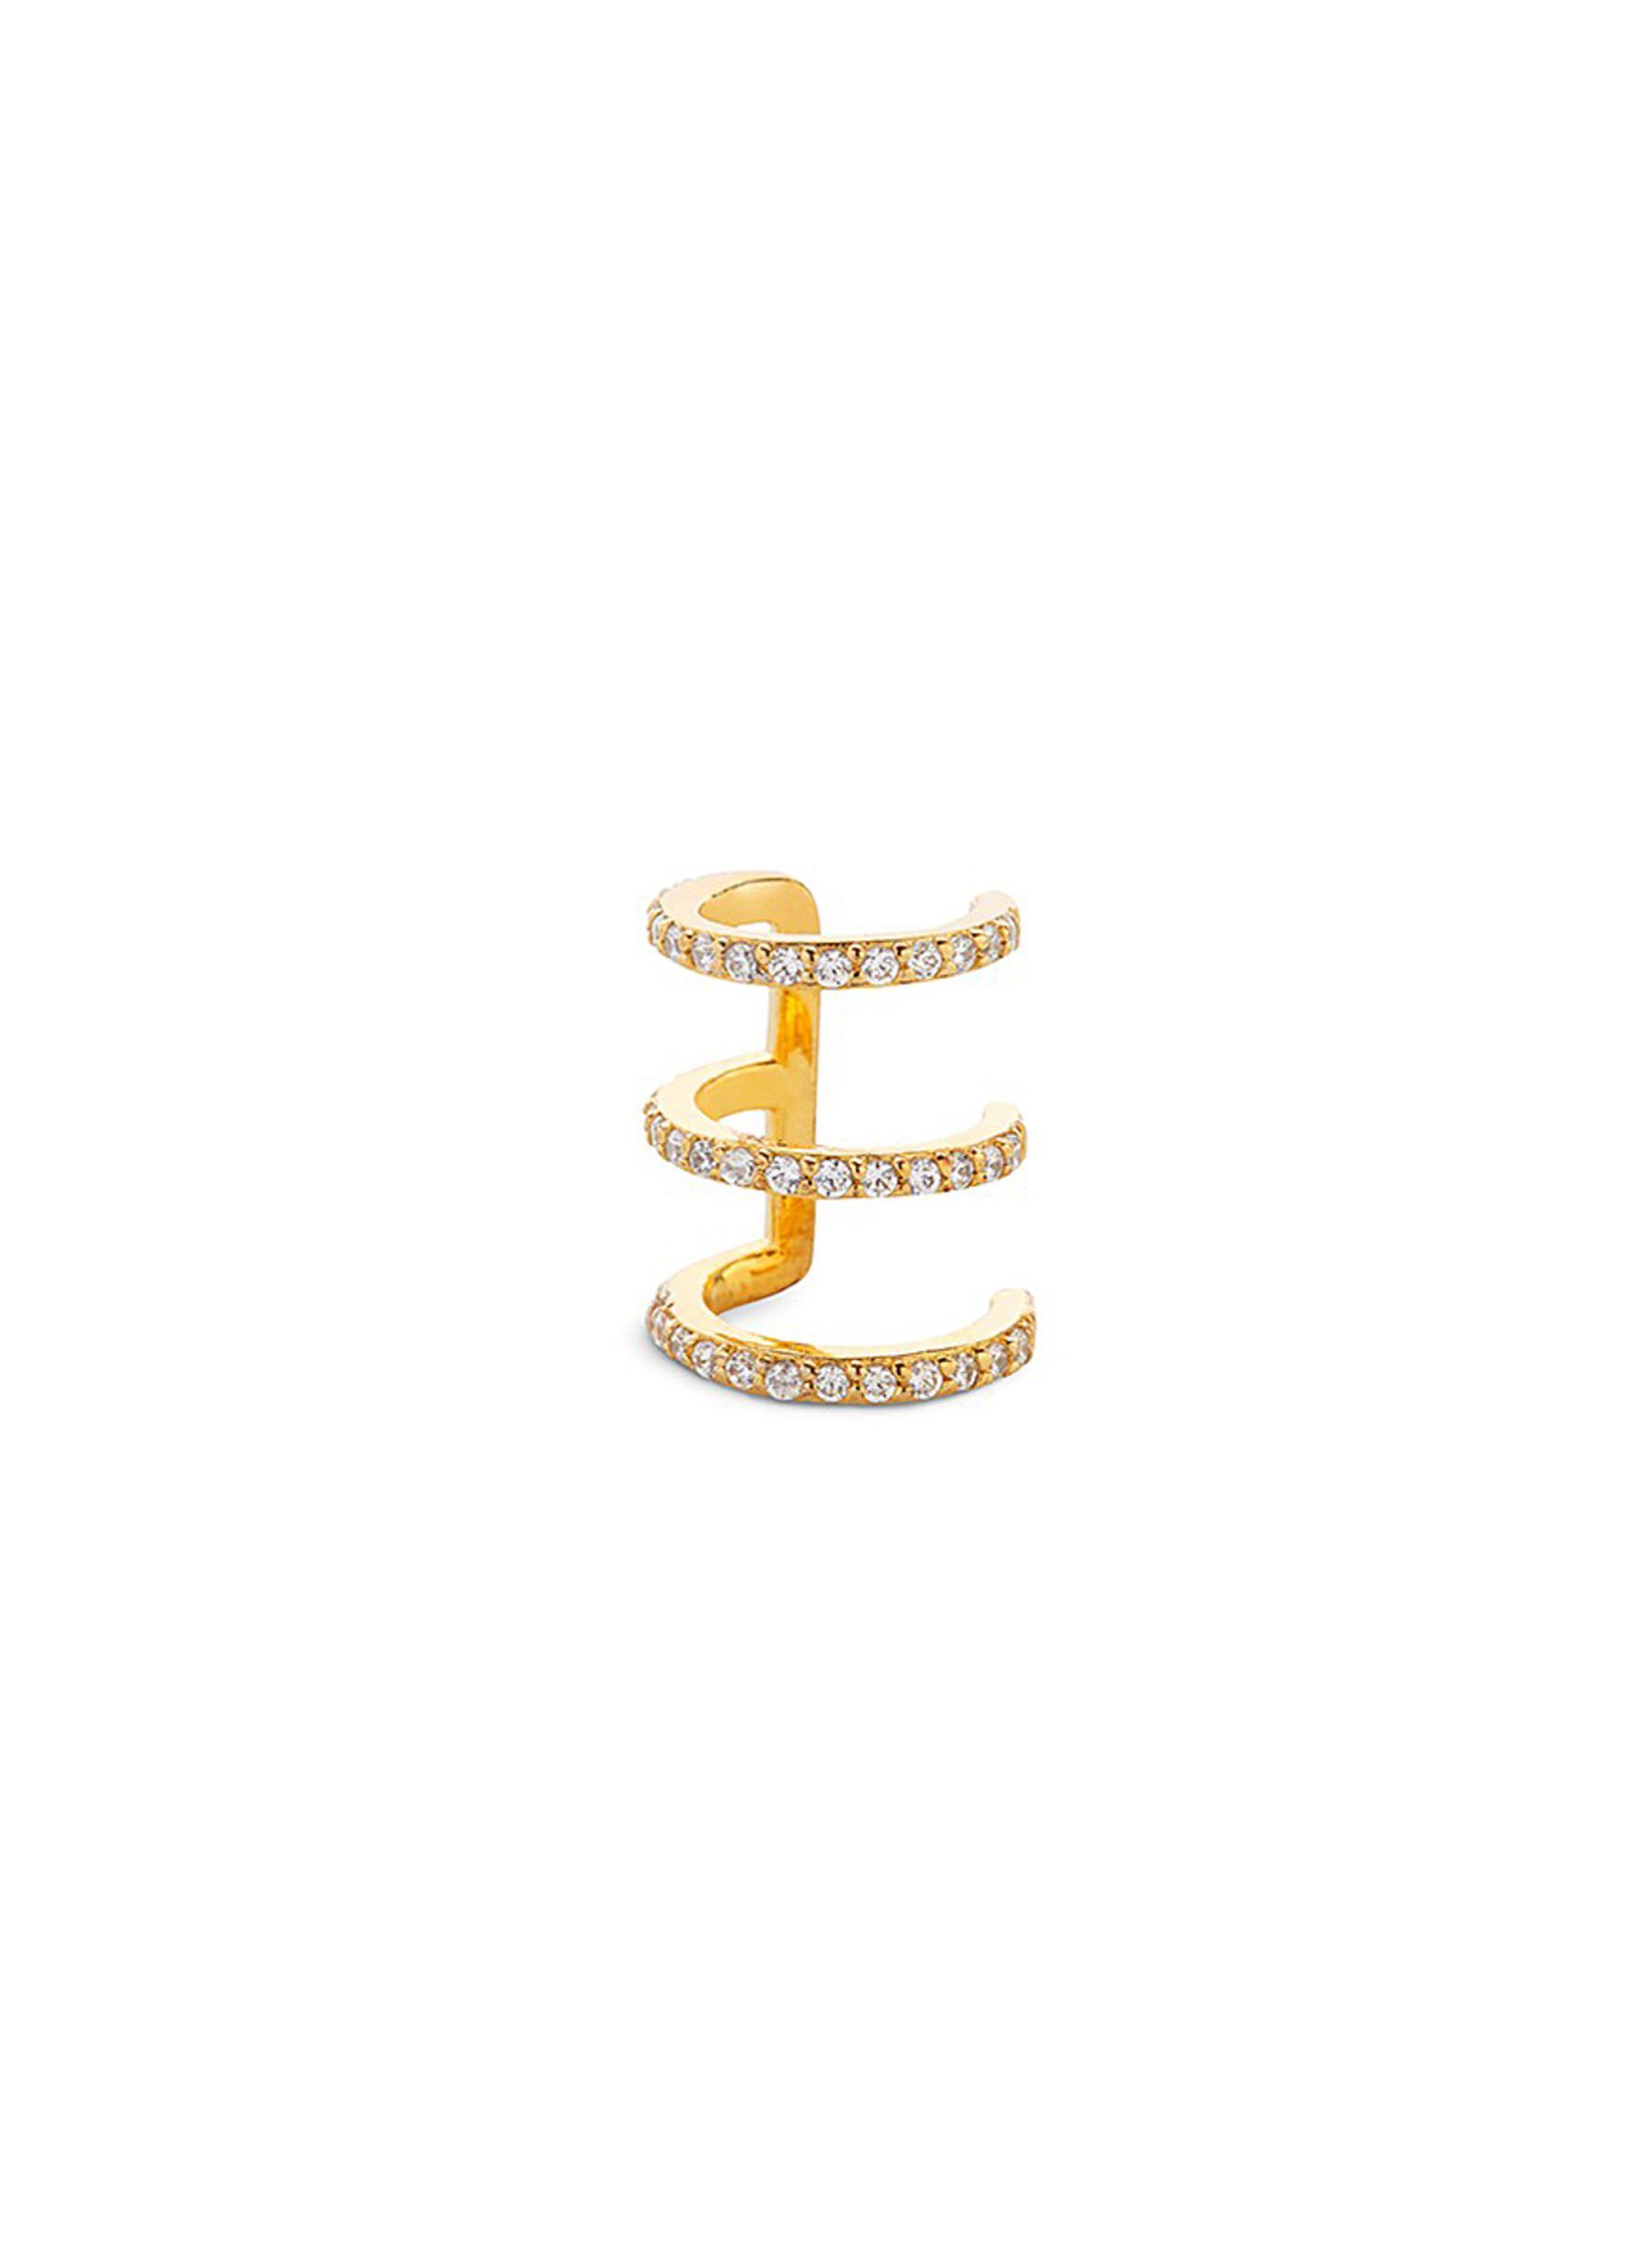 3Coil diamond 14k gold single ear cuff by Lynn Ban